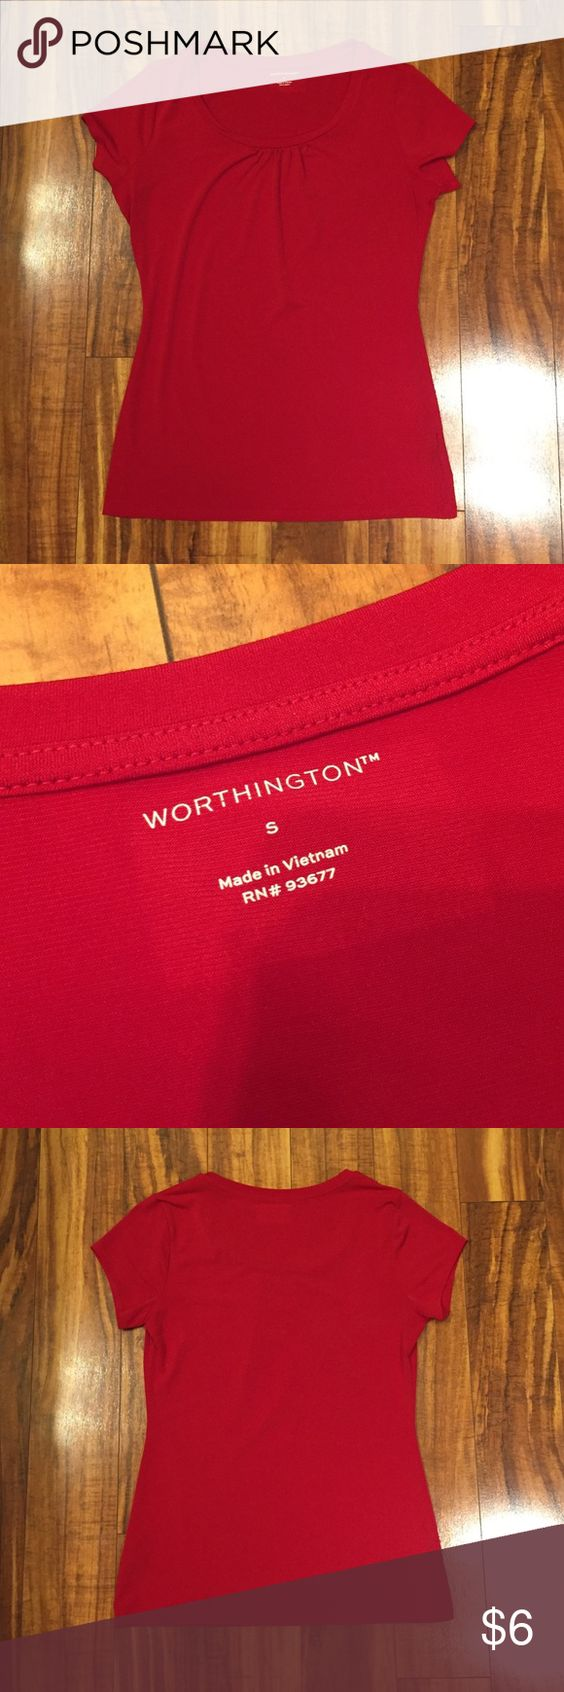 Worthington Top Worthington top. Red. EUC. Offers considered. Worthington Tops Blouses